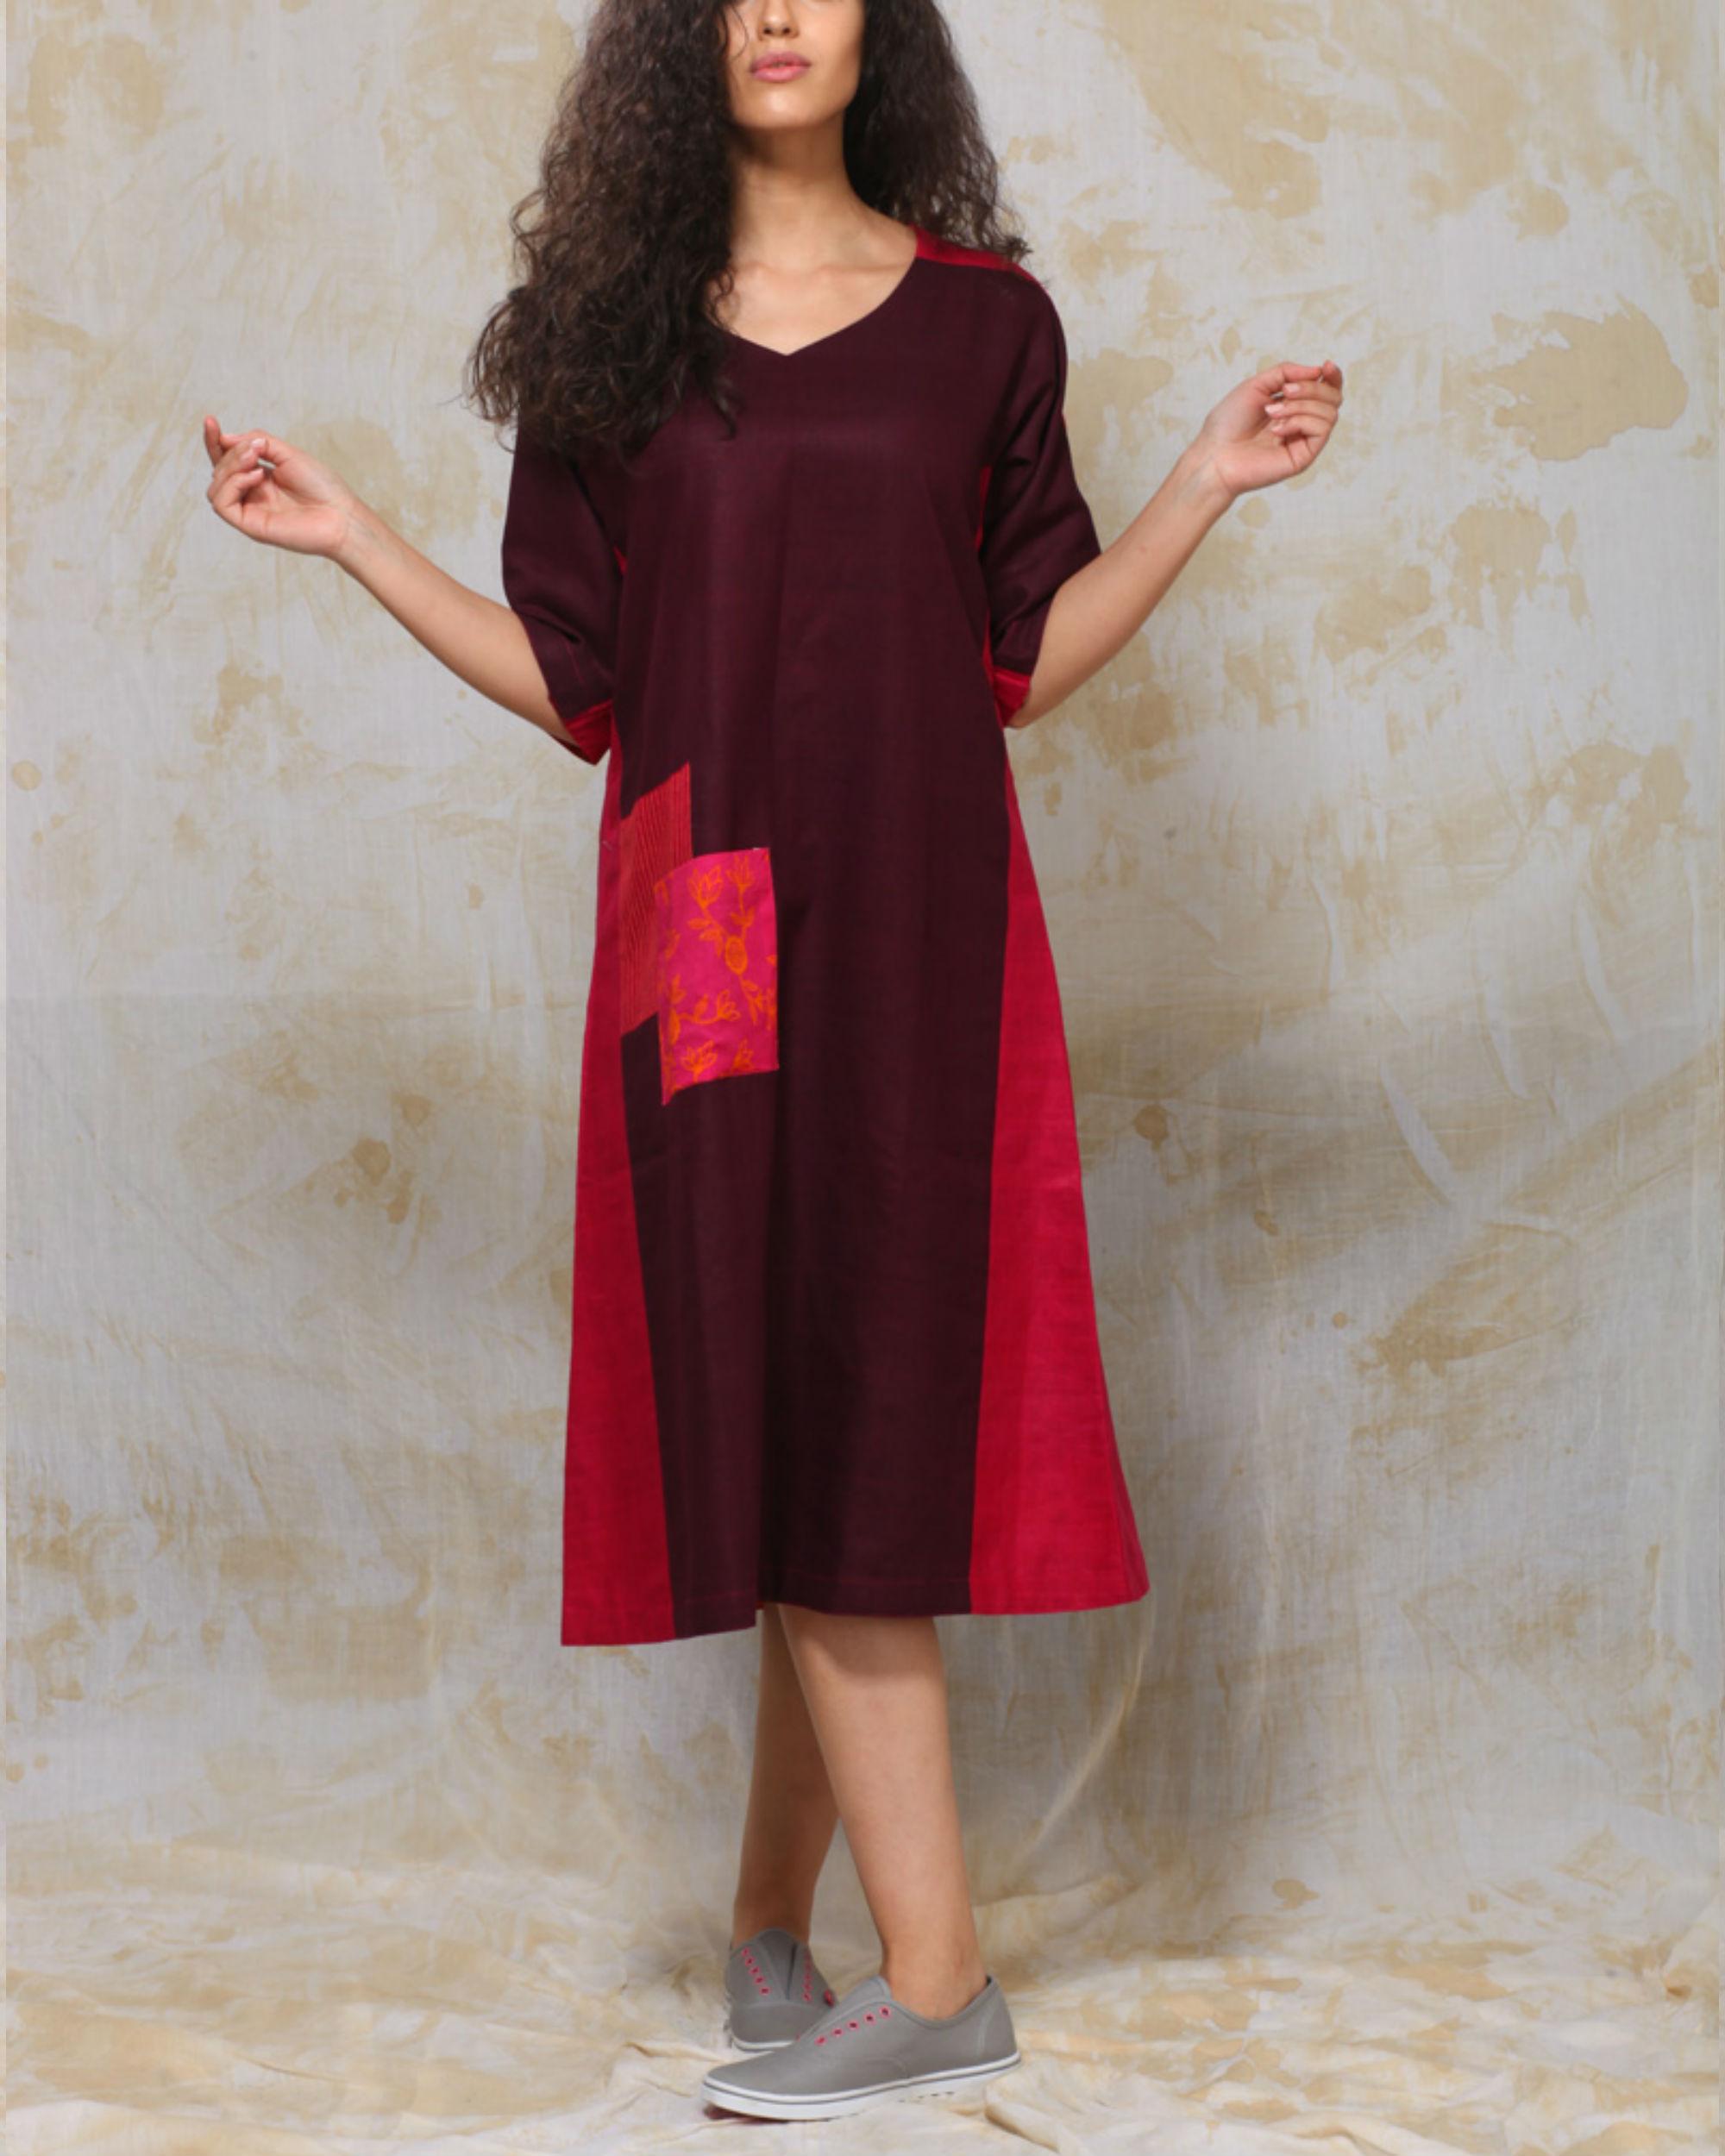 3bc5b016050b Summer plum dress by Udd | The Secret Label